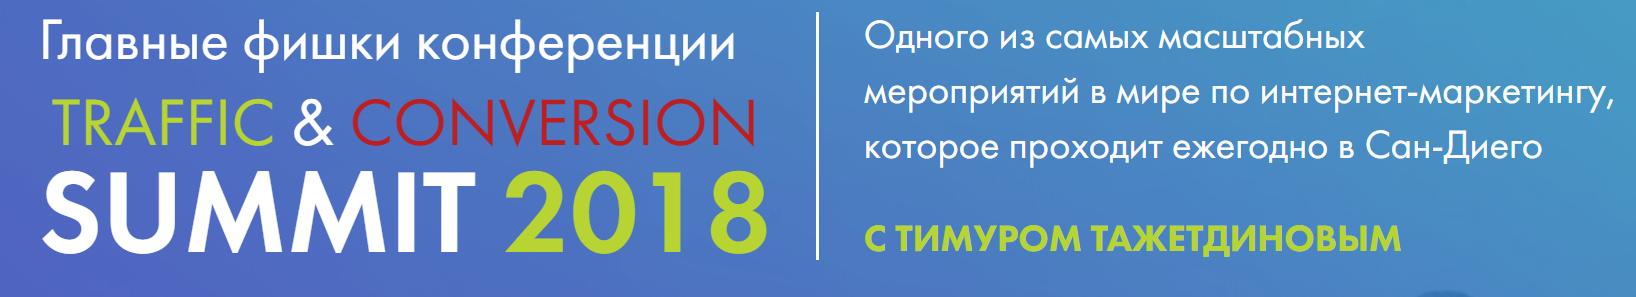 Главные фишки конференции Traffic and Conversion Summit 2018